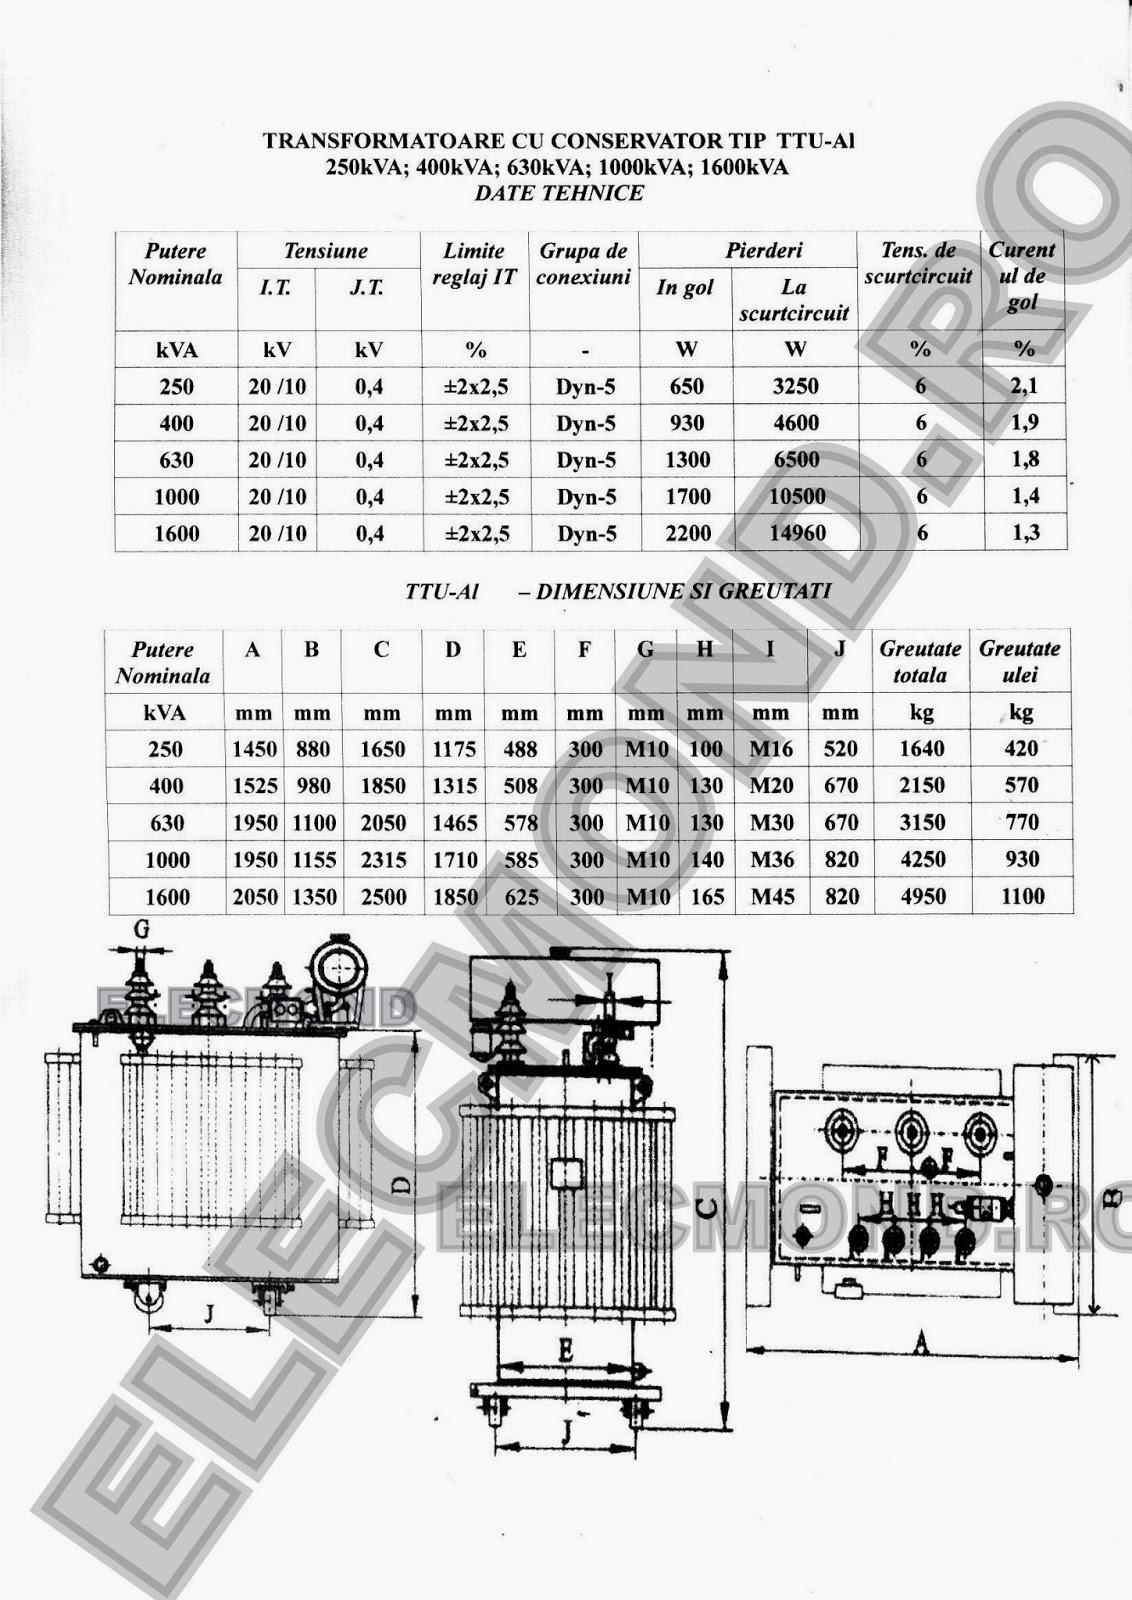 DATE TEHNICE TRANSFORMATOARE CU CONSERVATOR ALUMINIU 250 kVA 400 kVA 630 kVA 1000 kVA 1600 kVA, elecmond  ,